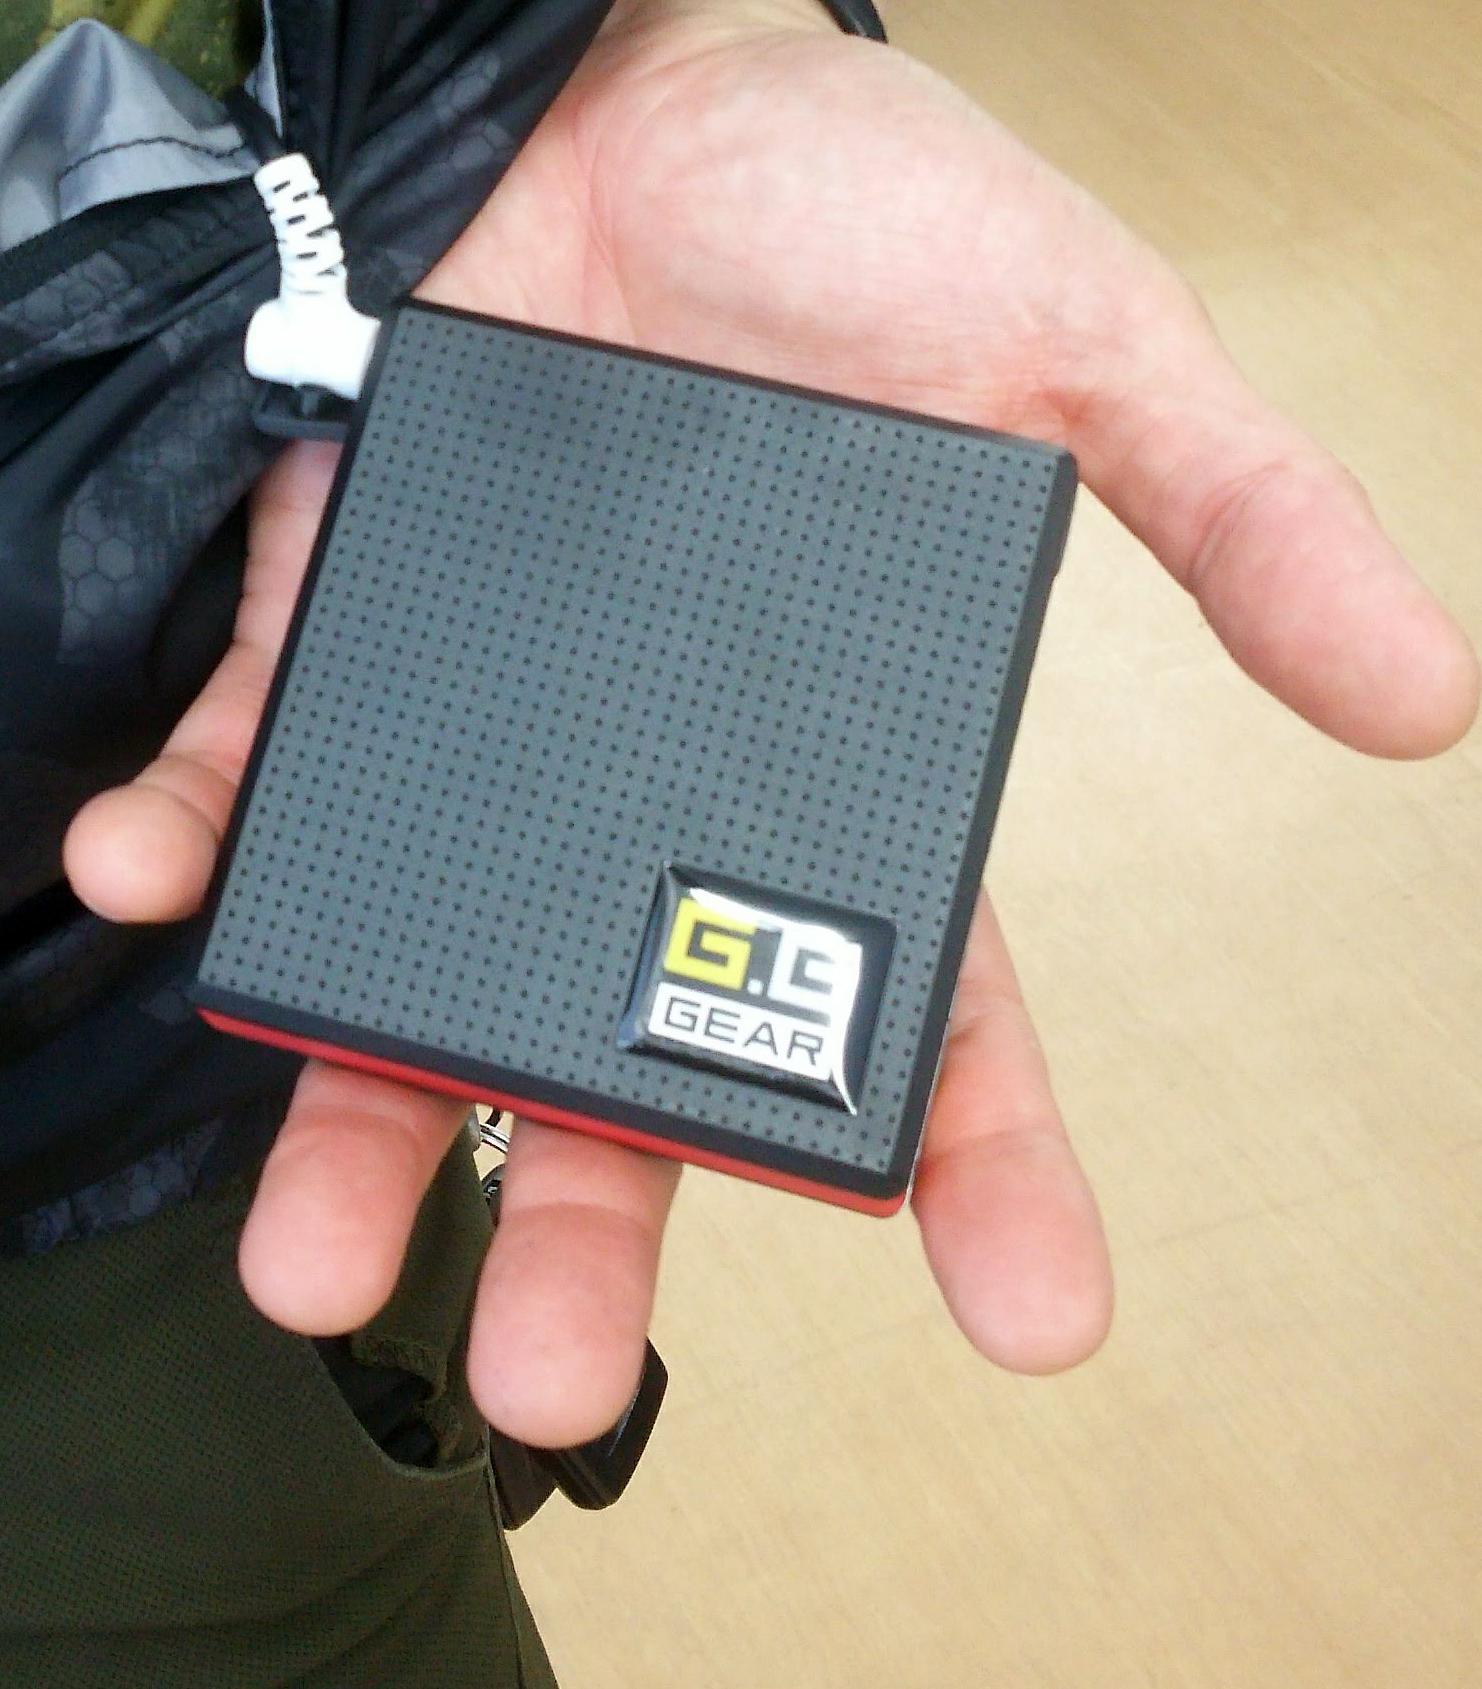 G.GROUND~ジーグランド~18002 小型バッテリー業界最軽量245g